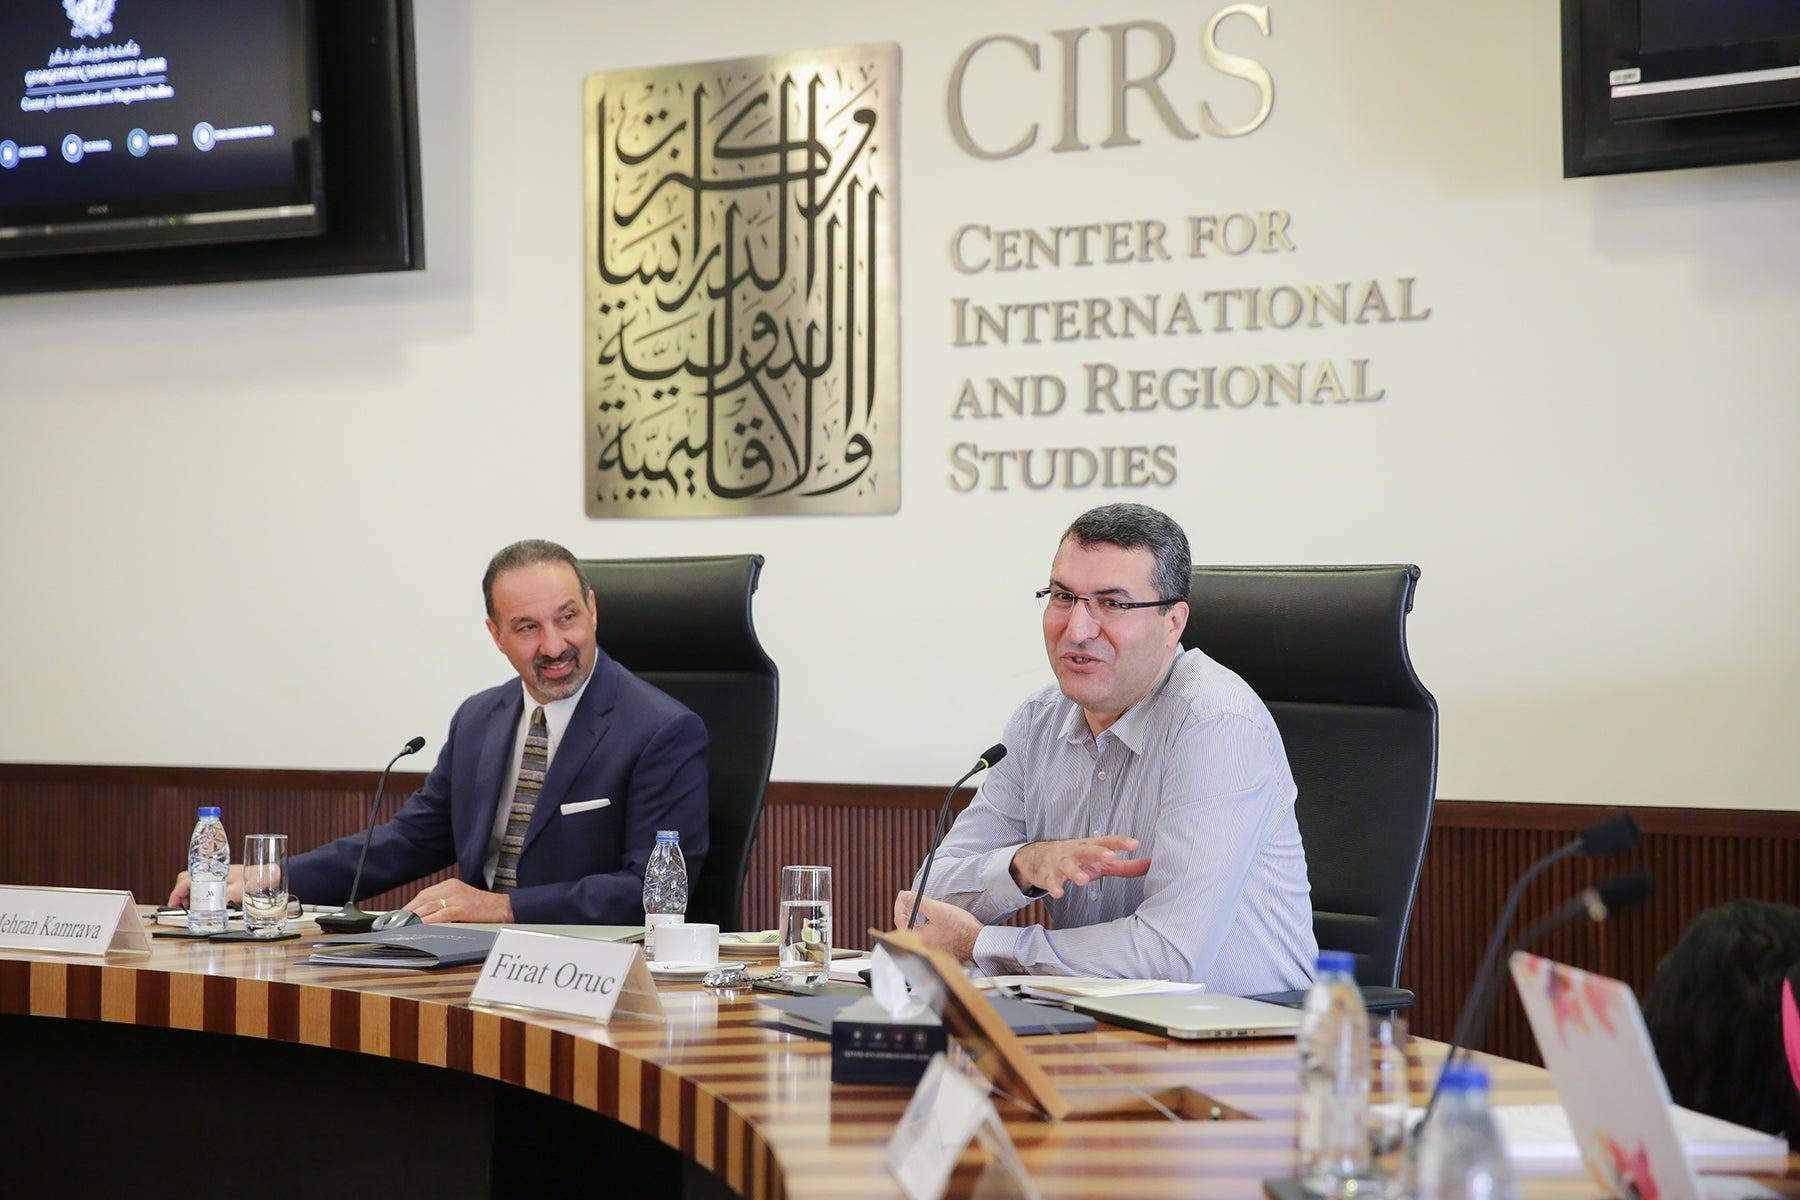 Firat Oruc CIRS Faculty Publication Workshop